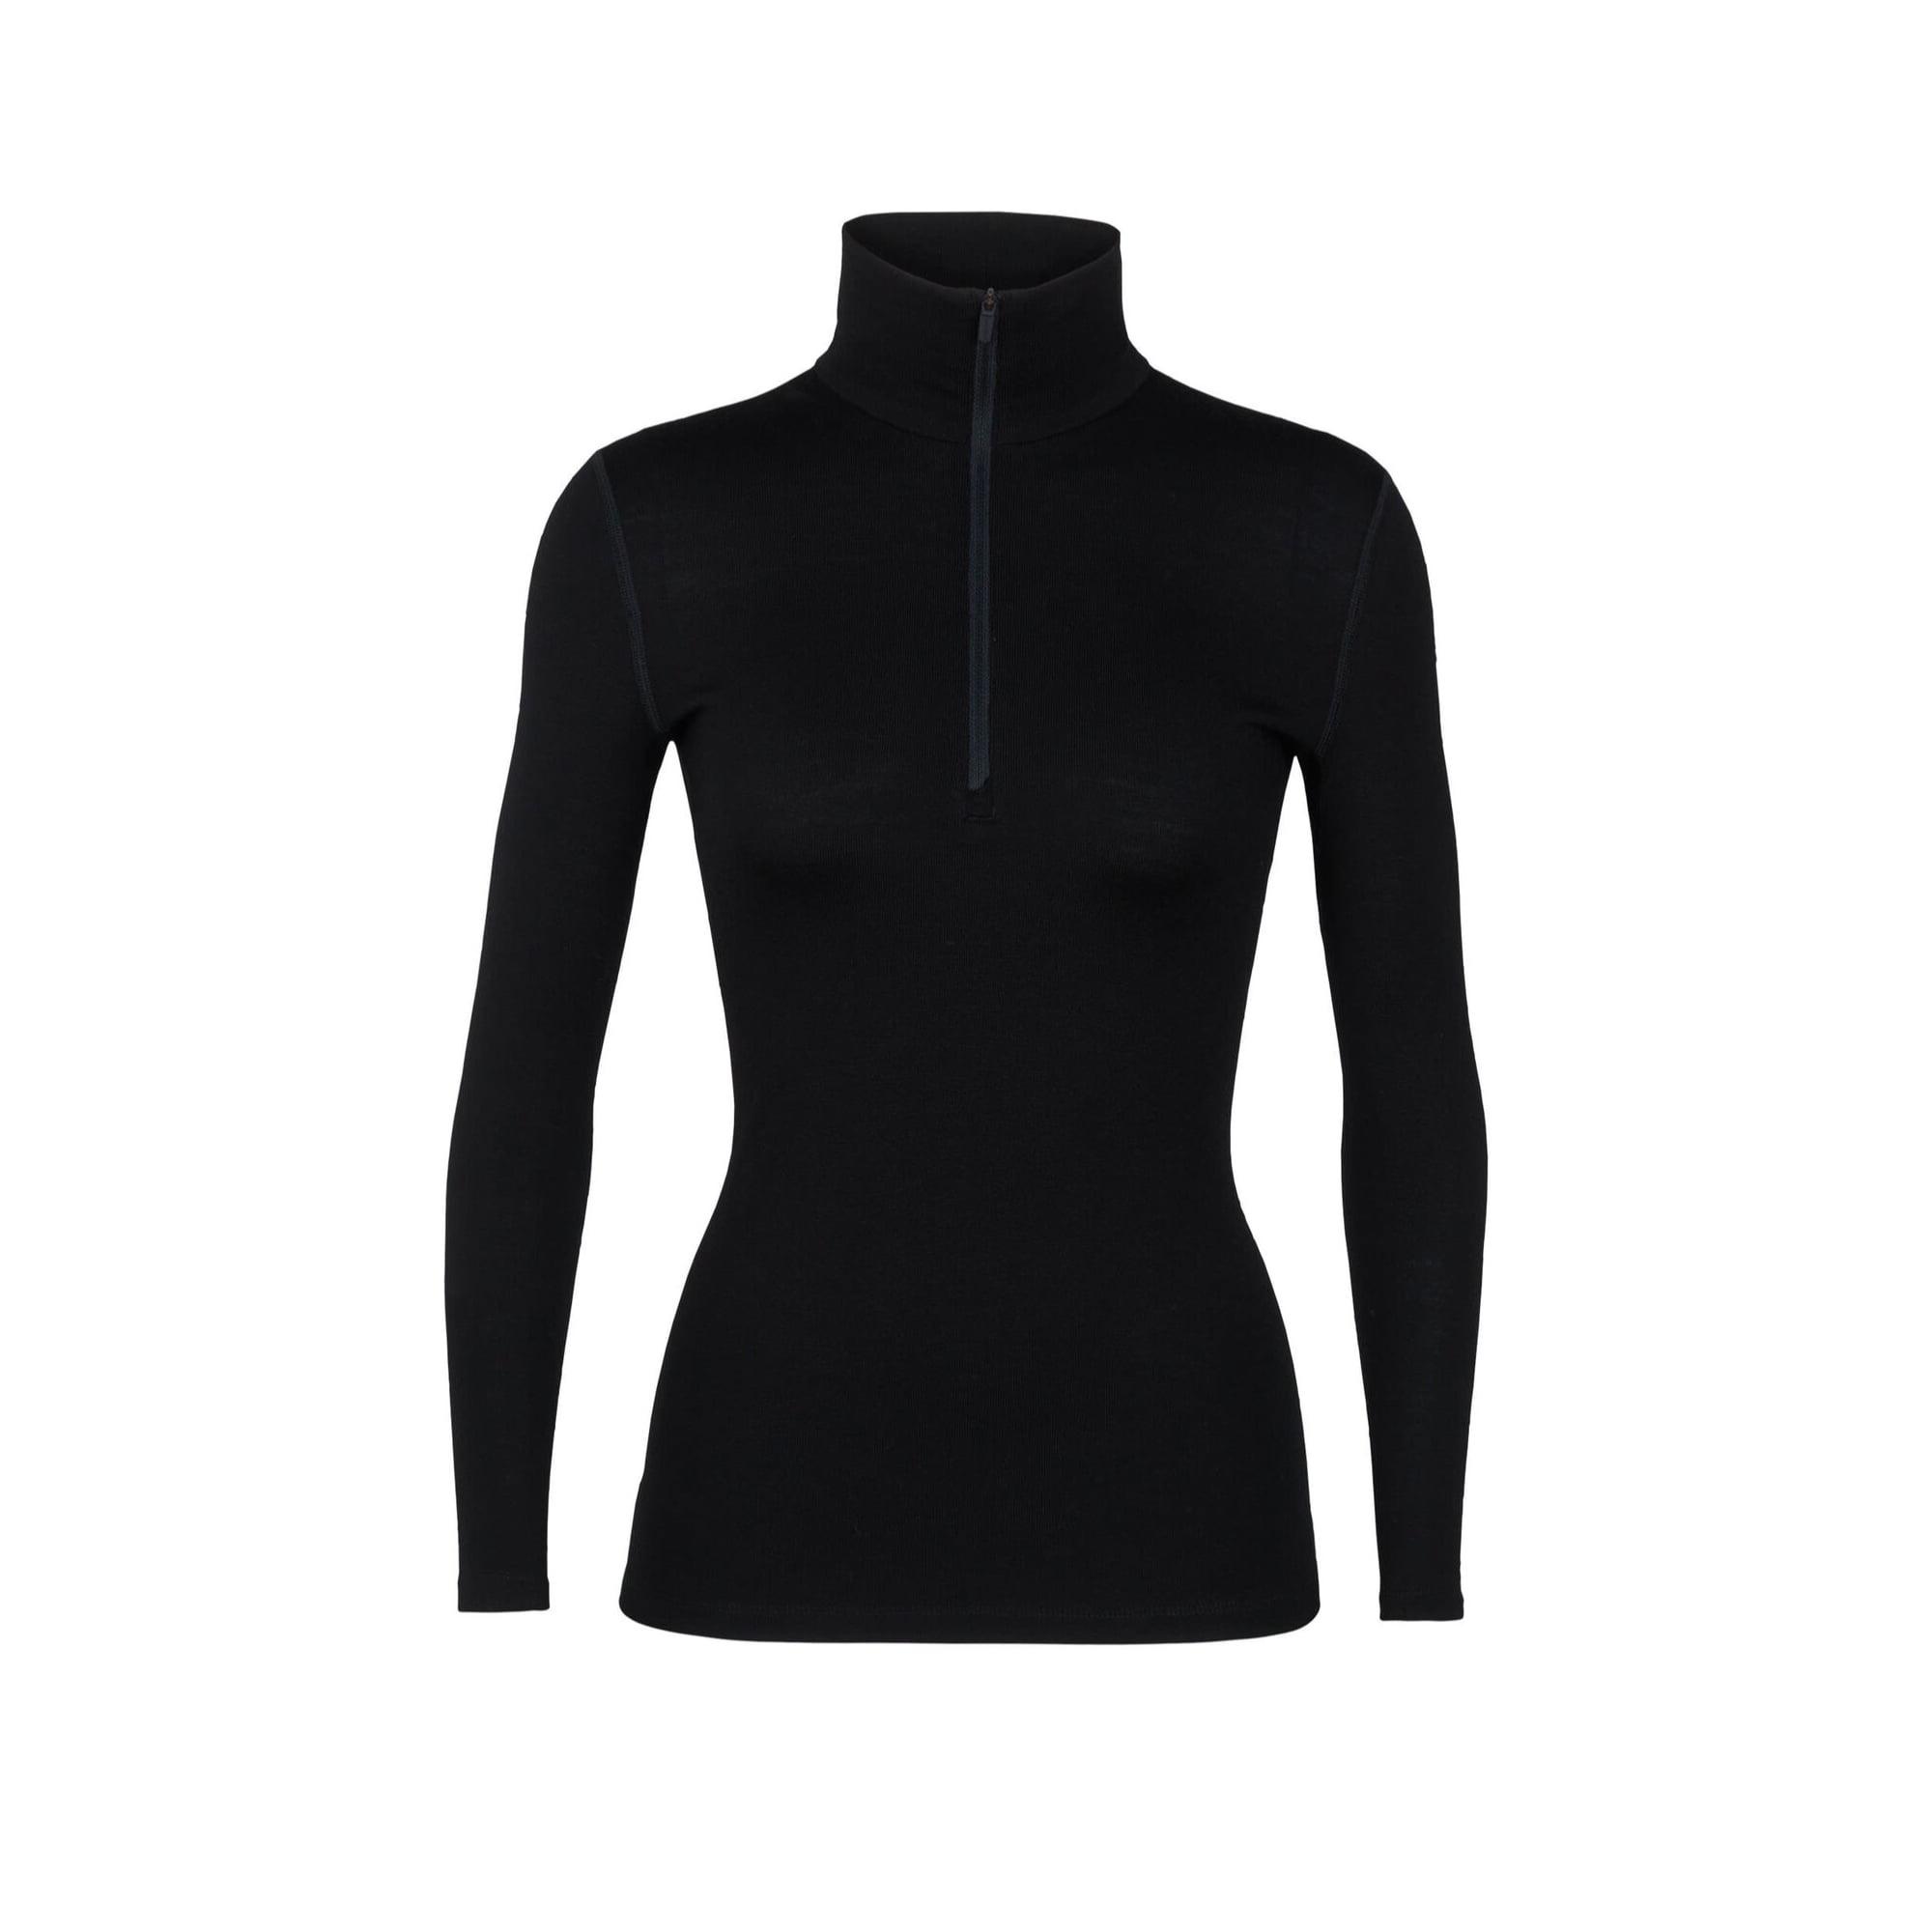 Women's 260 Tech Long Sleeve Half Zip-1